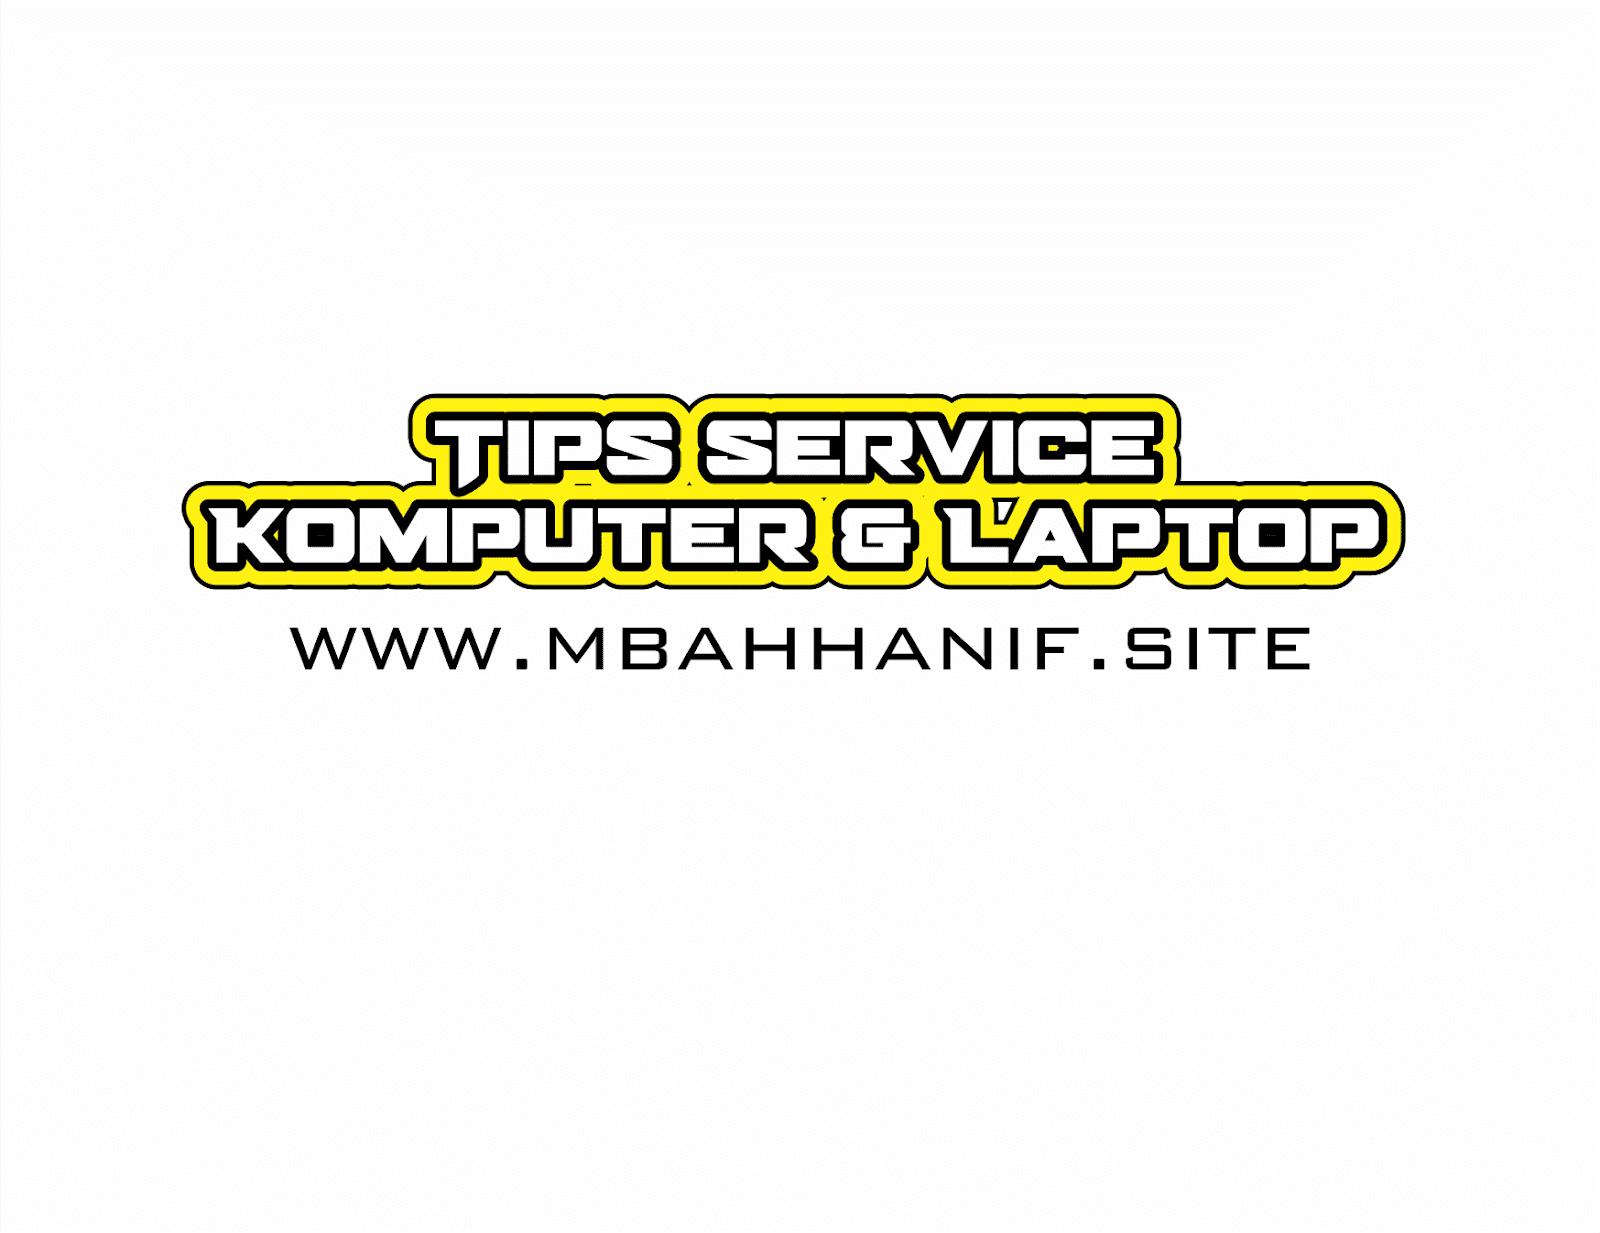 Logo Service Komputer